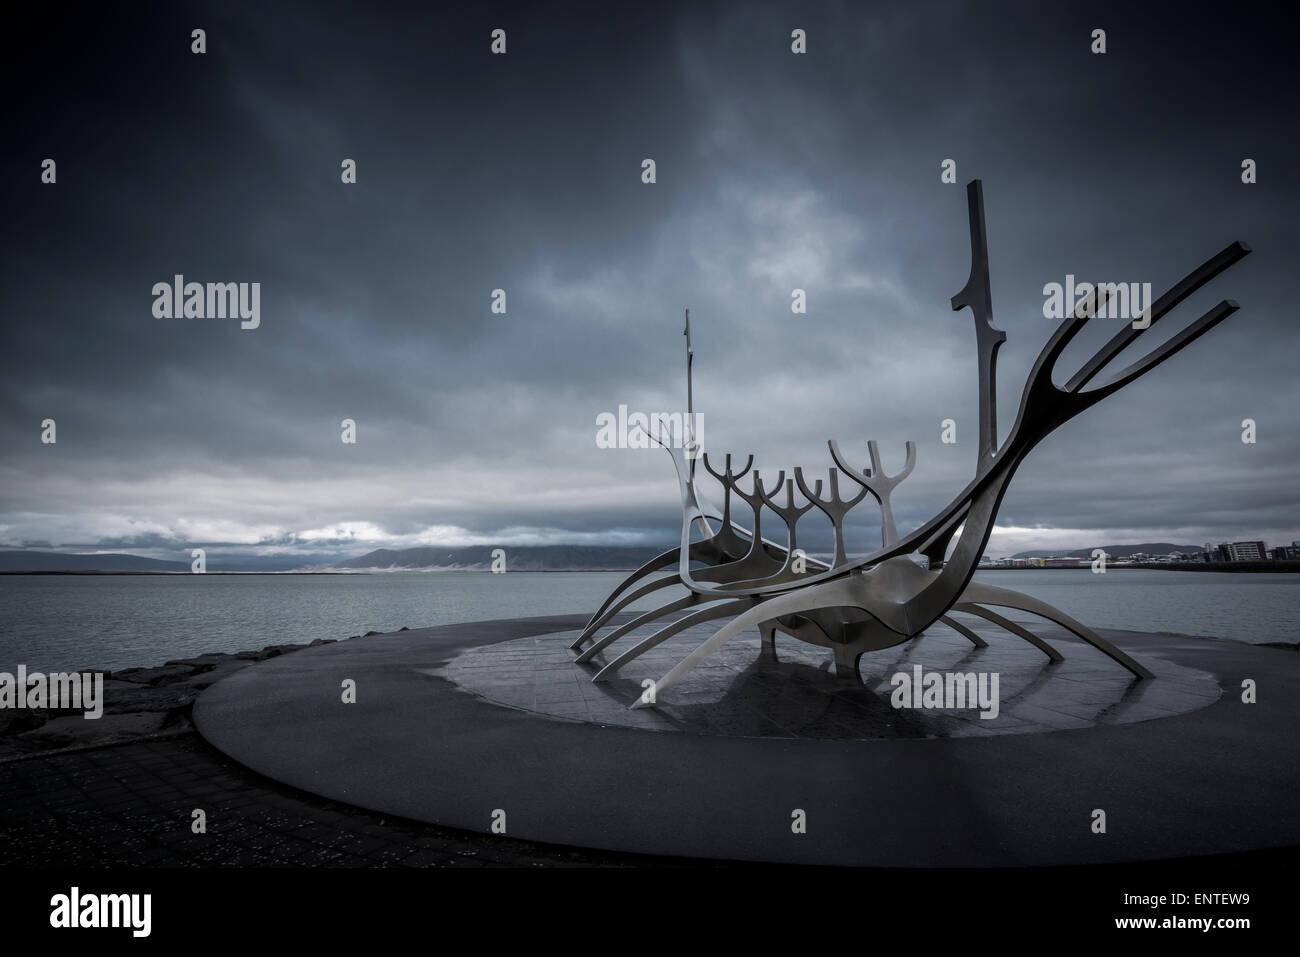 Iceland, Reykjavik, Solfar Viking ship Sculpture - Stock Image